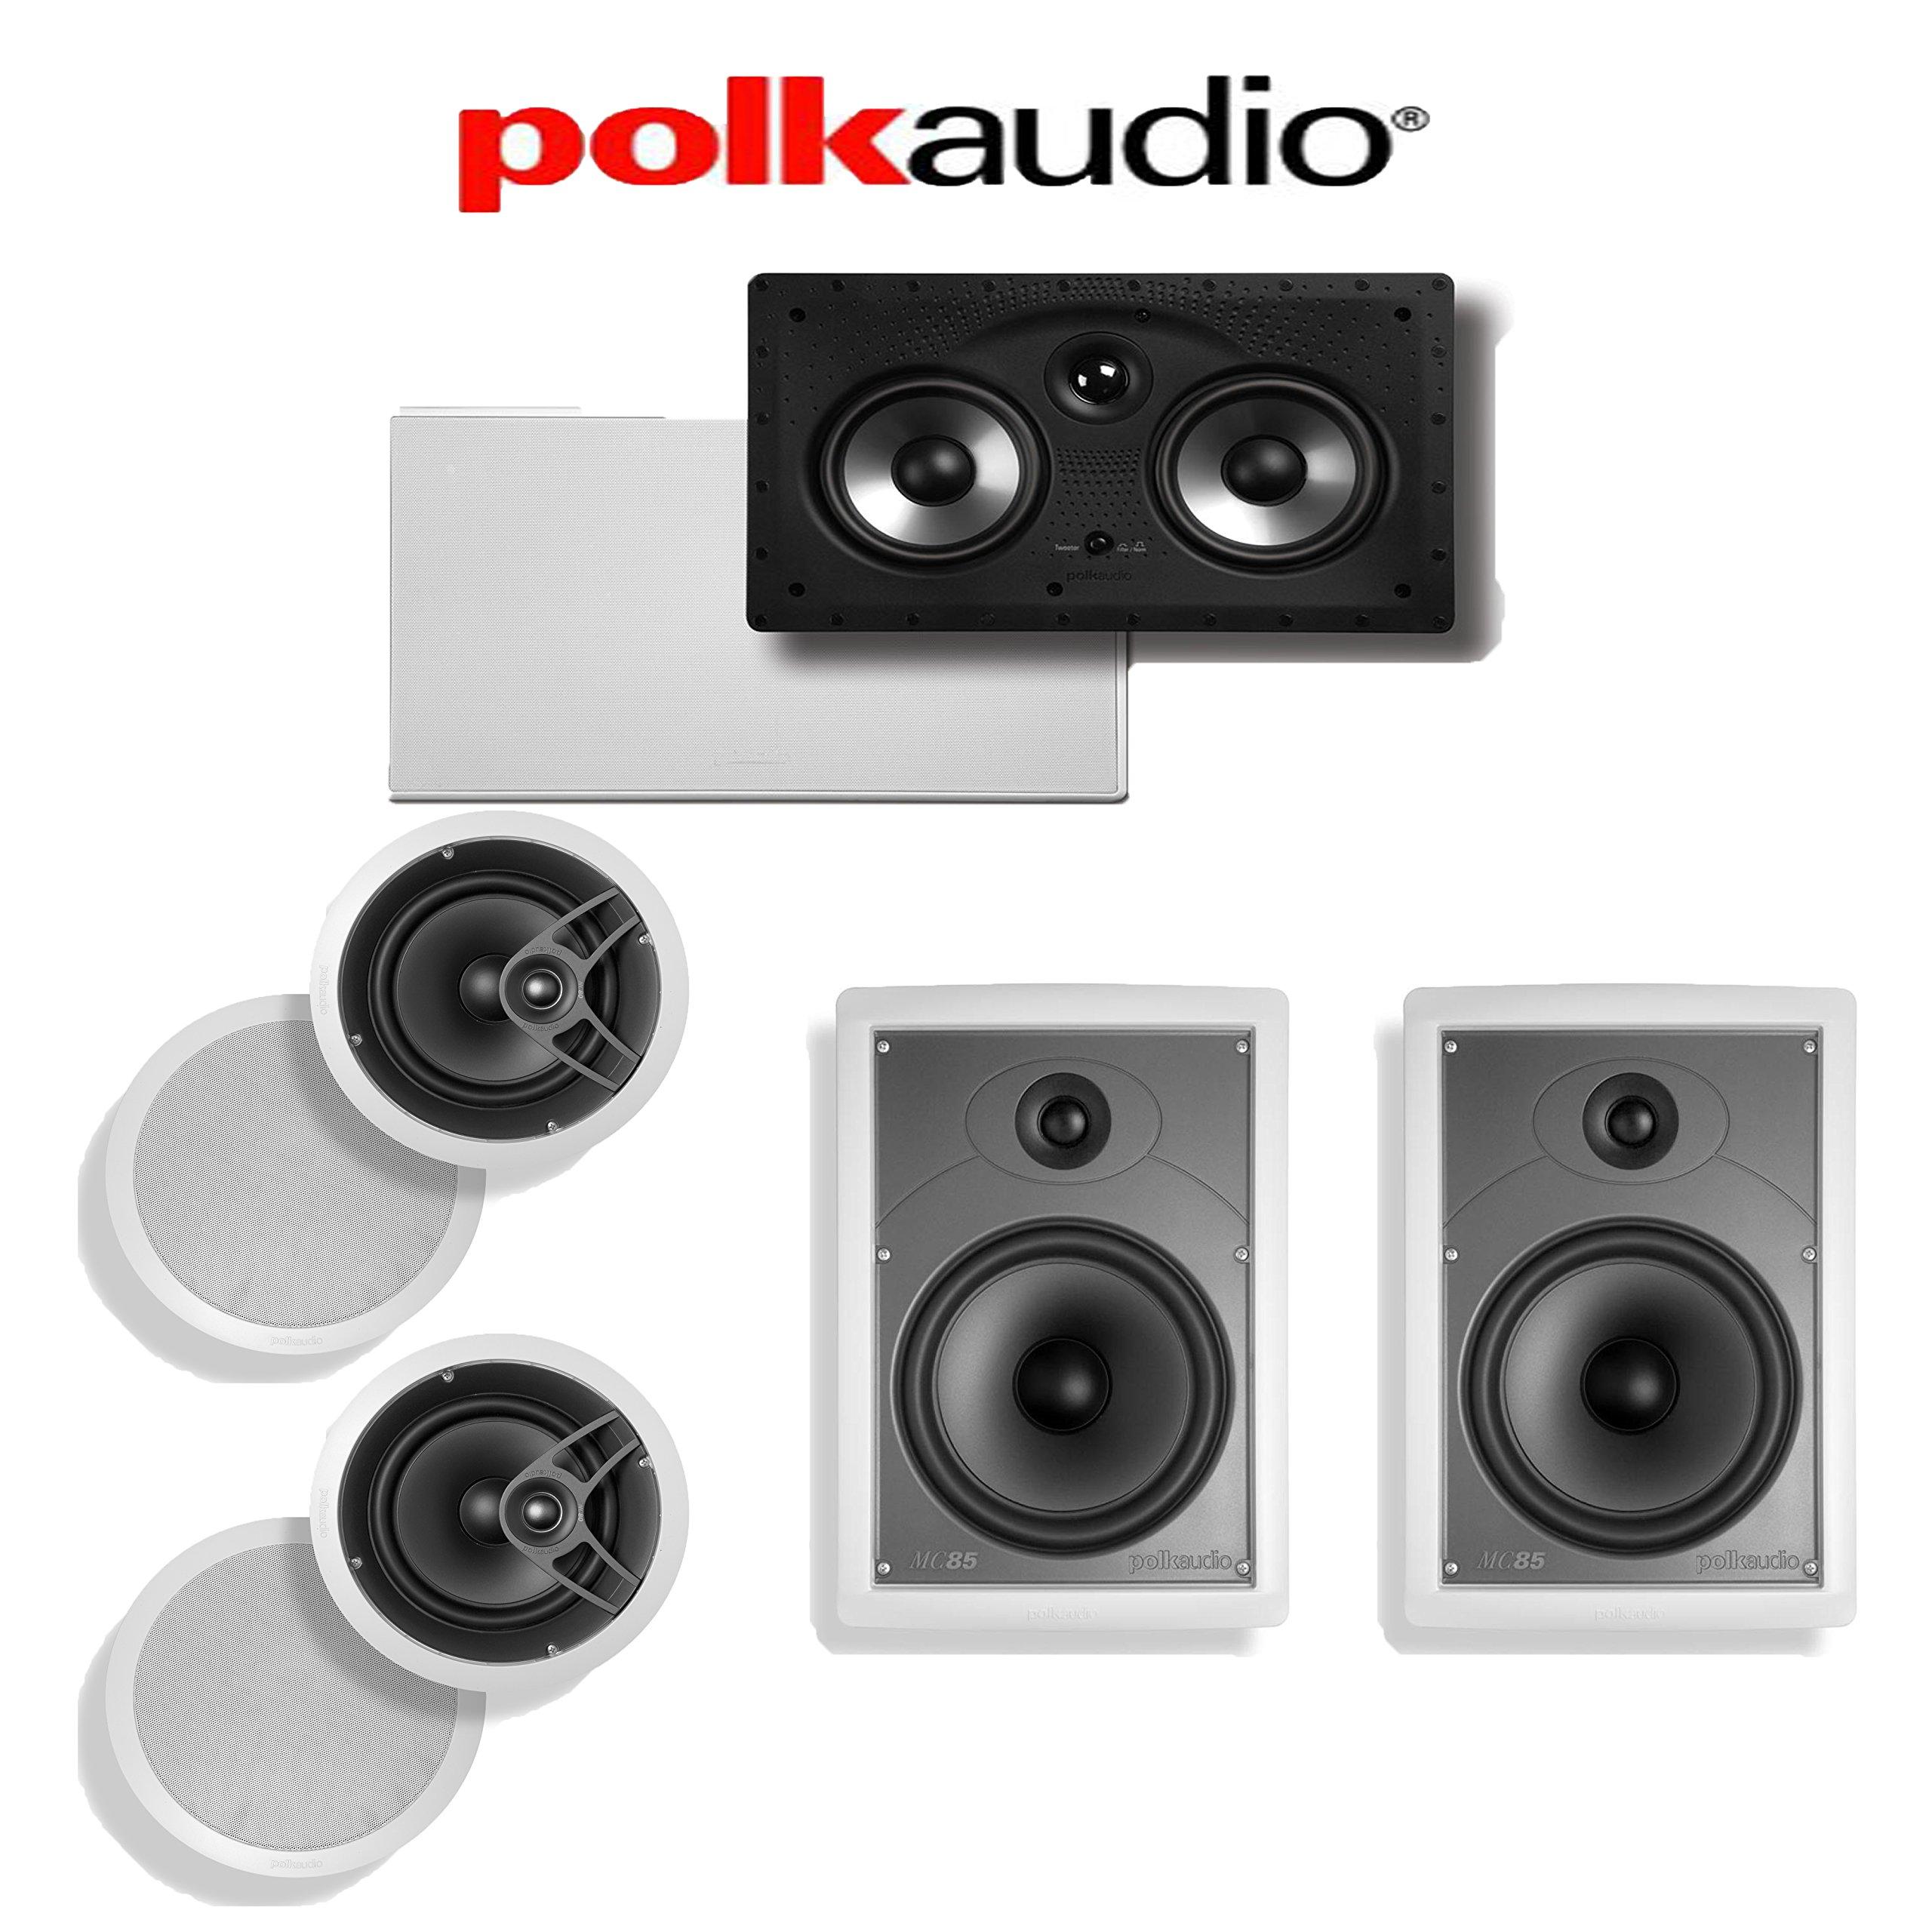 Polk Audio MC80 5.0 In-Wall / In-Ceiling Home Theater Speaker System (MC80 + MC85 + 255C-RT) by Polk Audio